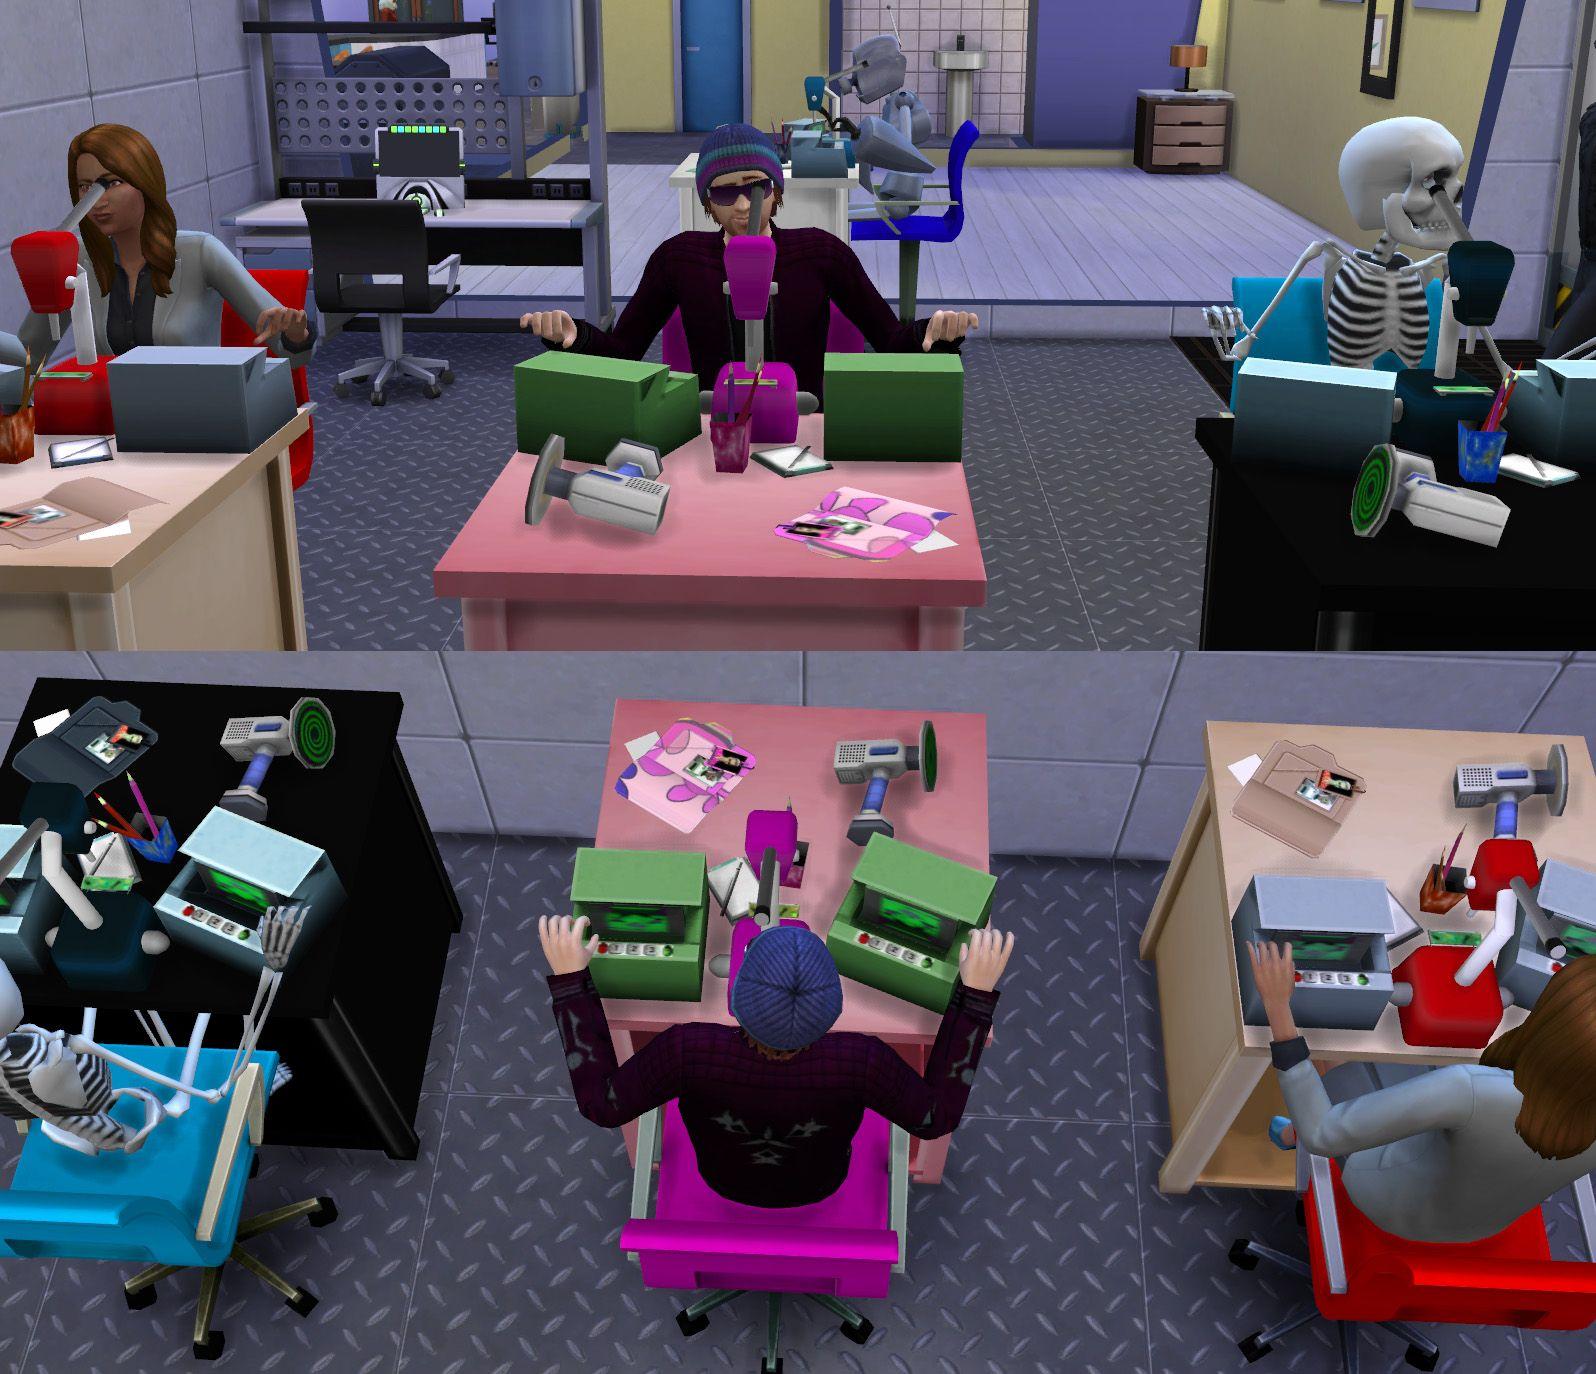 Modthesims Smaller Microscope Alternative Sims 4 Skills Sims 4 Update Sims 4